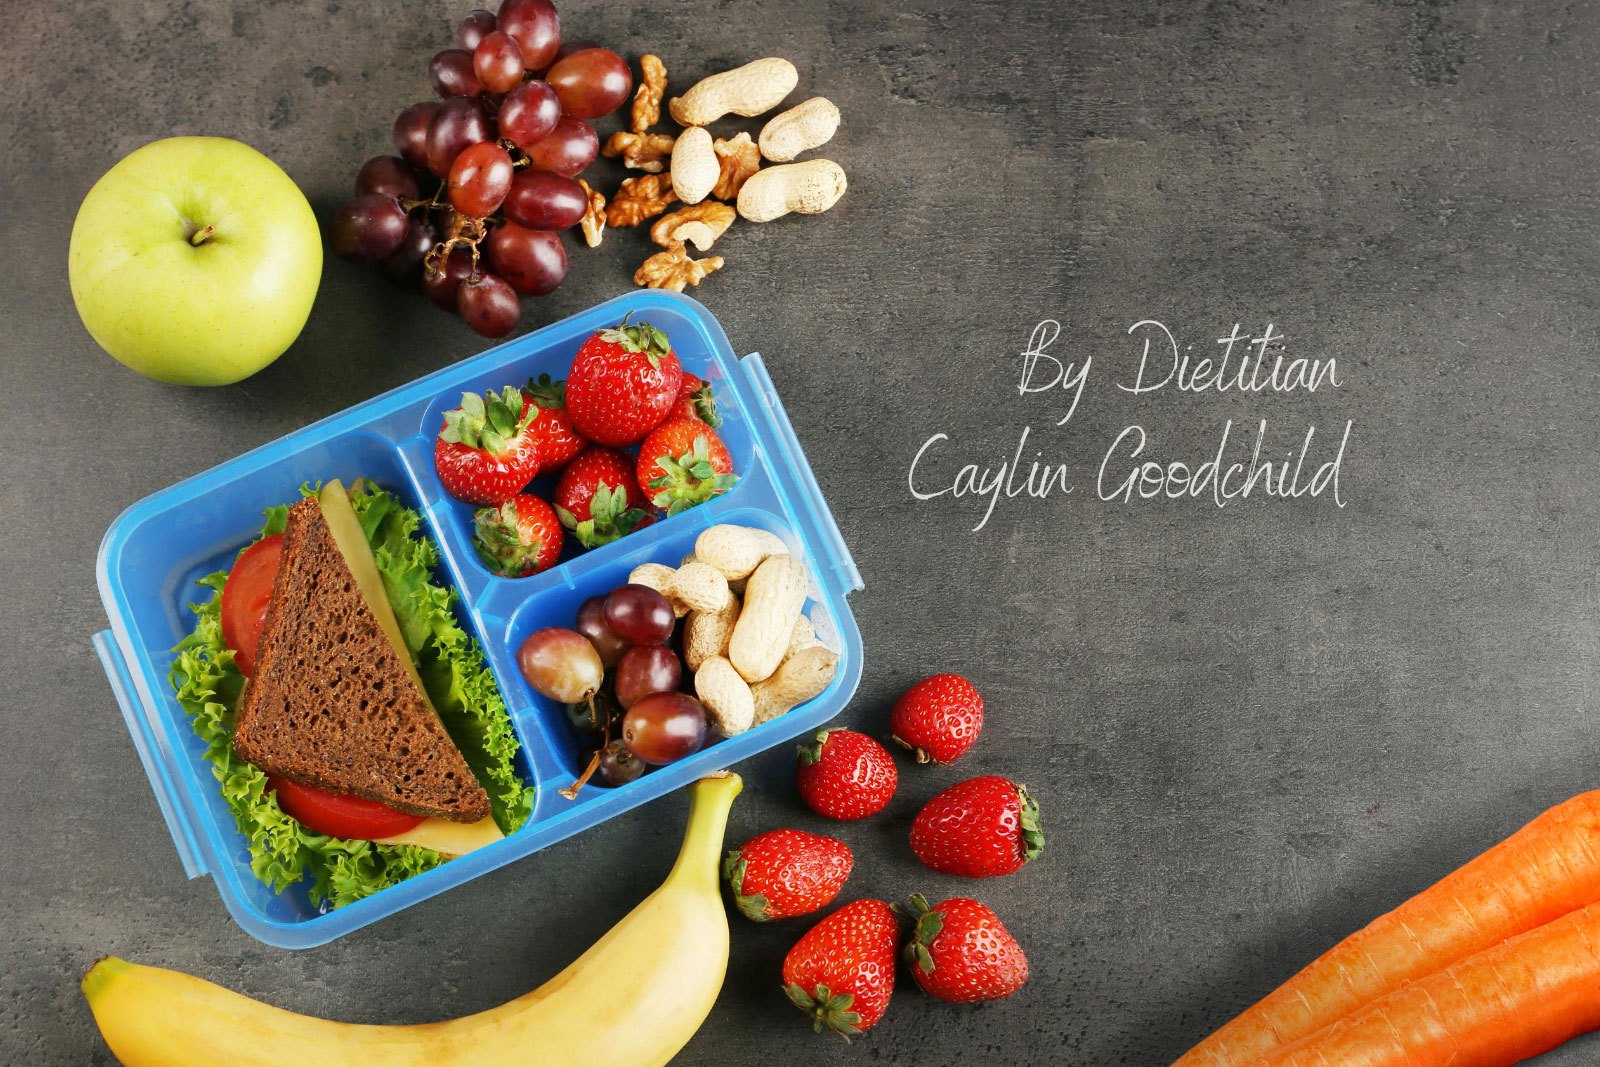 Caylin Goodchild Lunchbox build